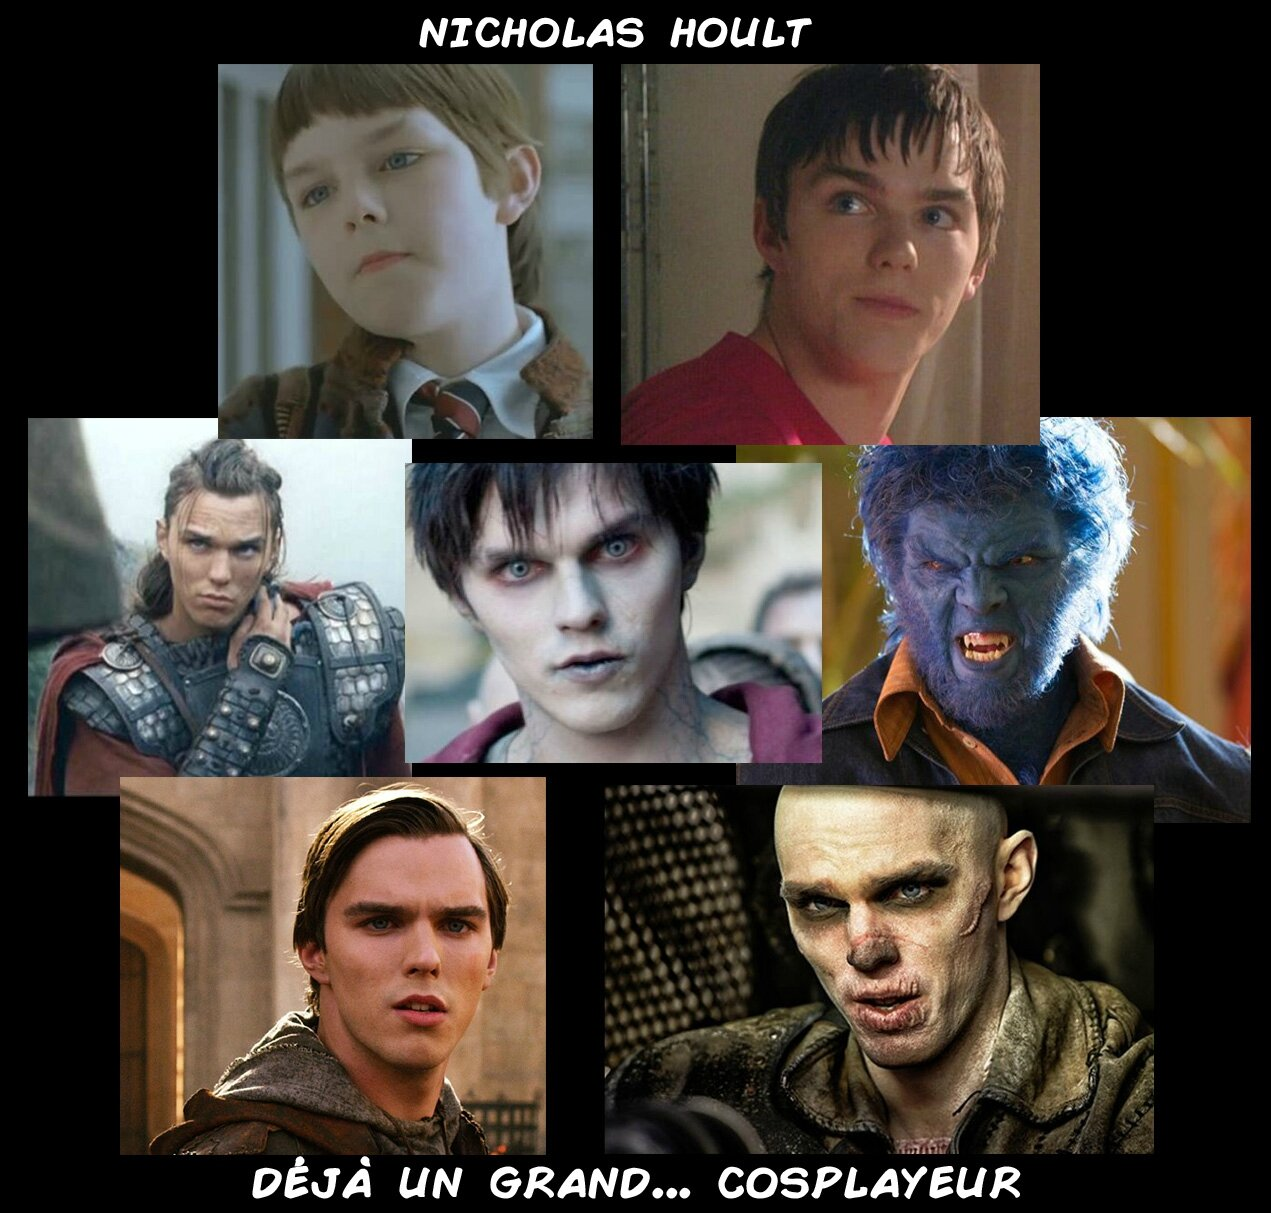 Nicholas Hoult Evolution